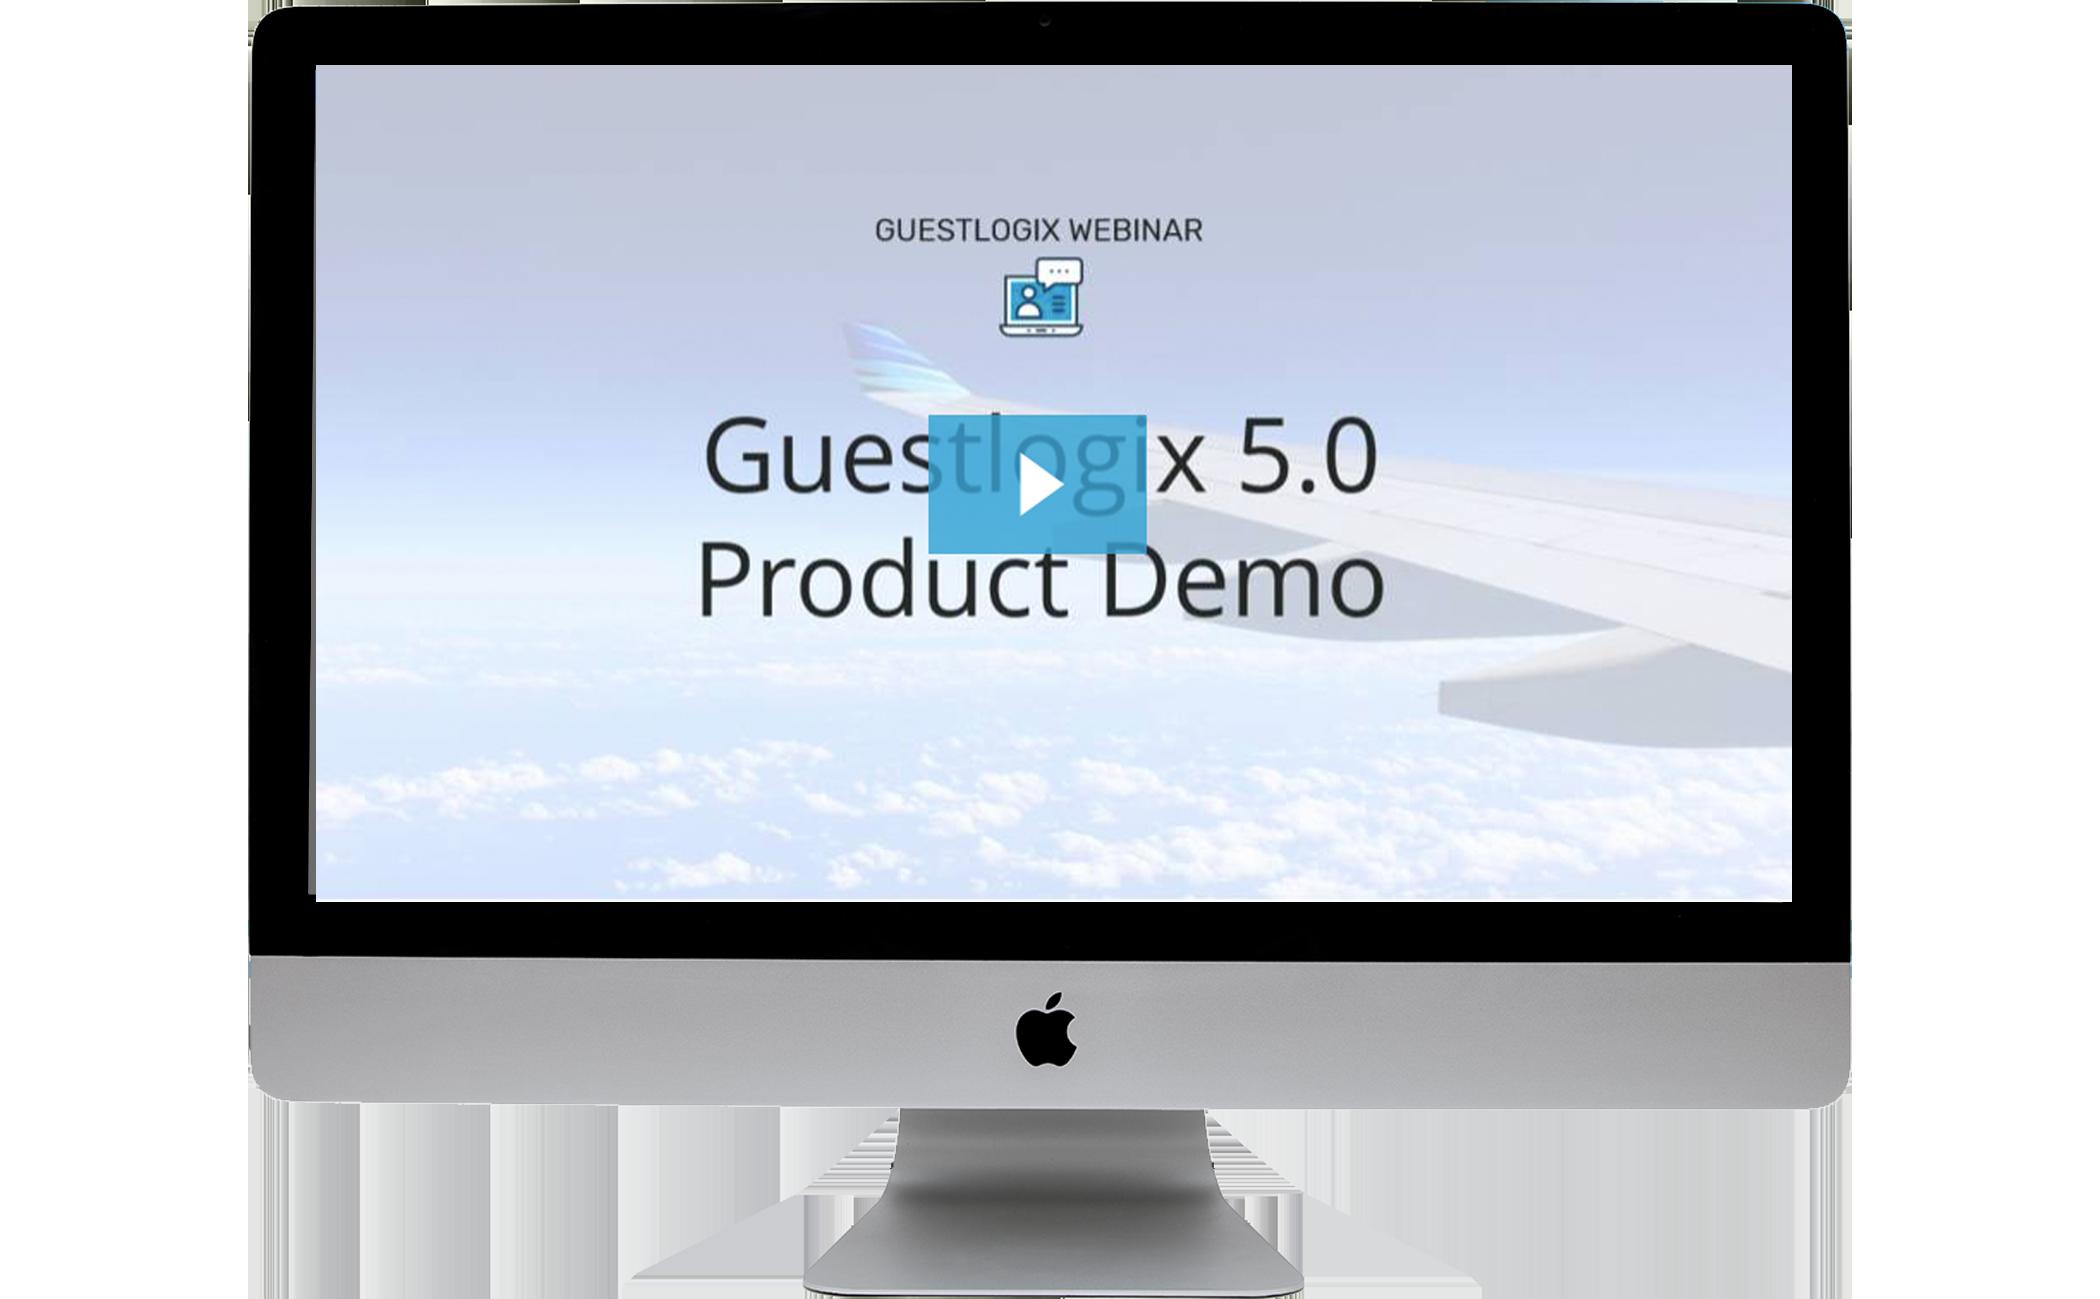 Guestlogix 5.0 Platform Demo